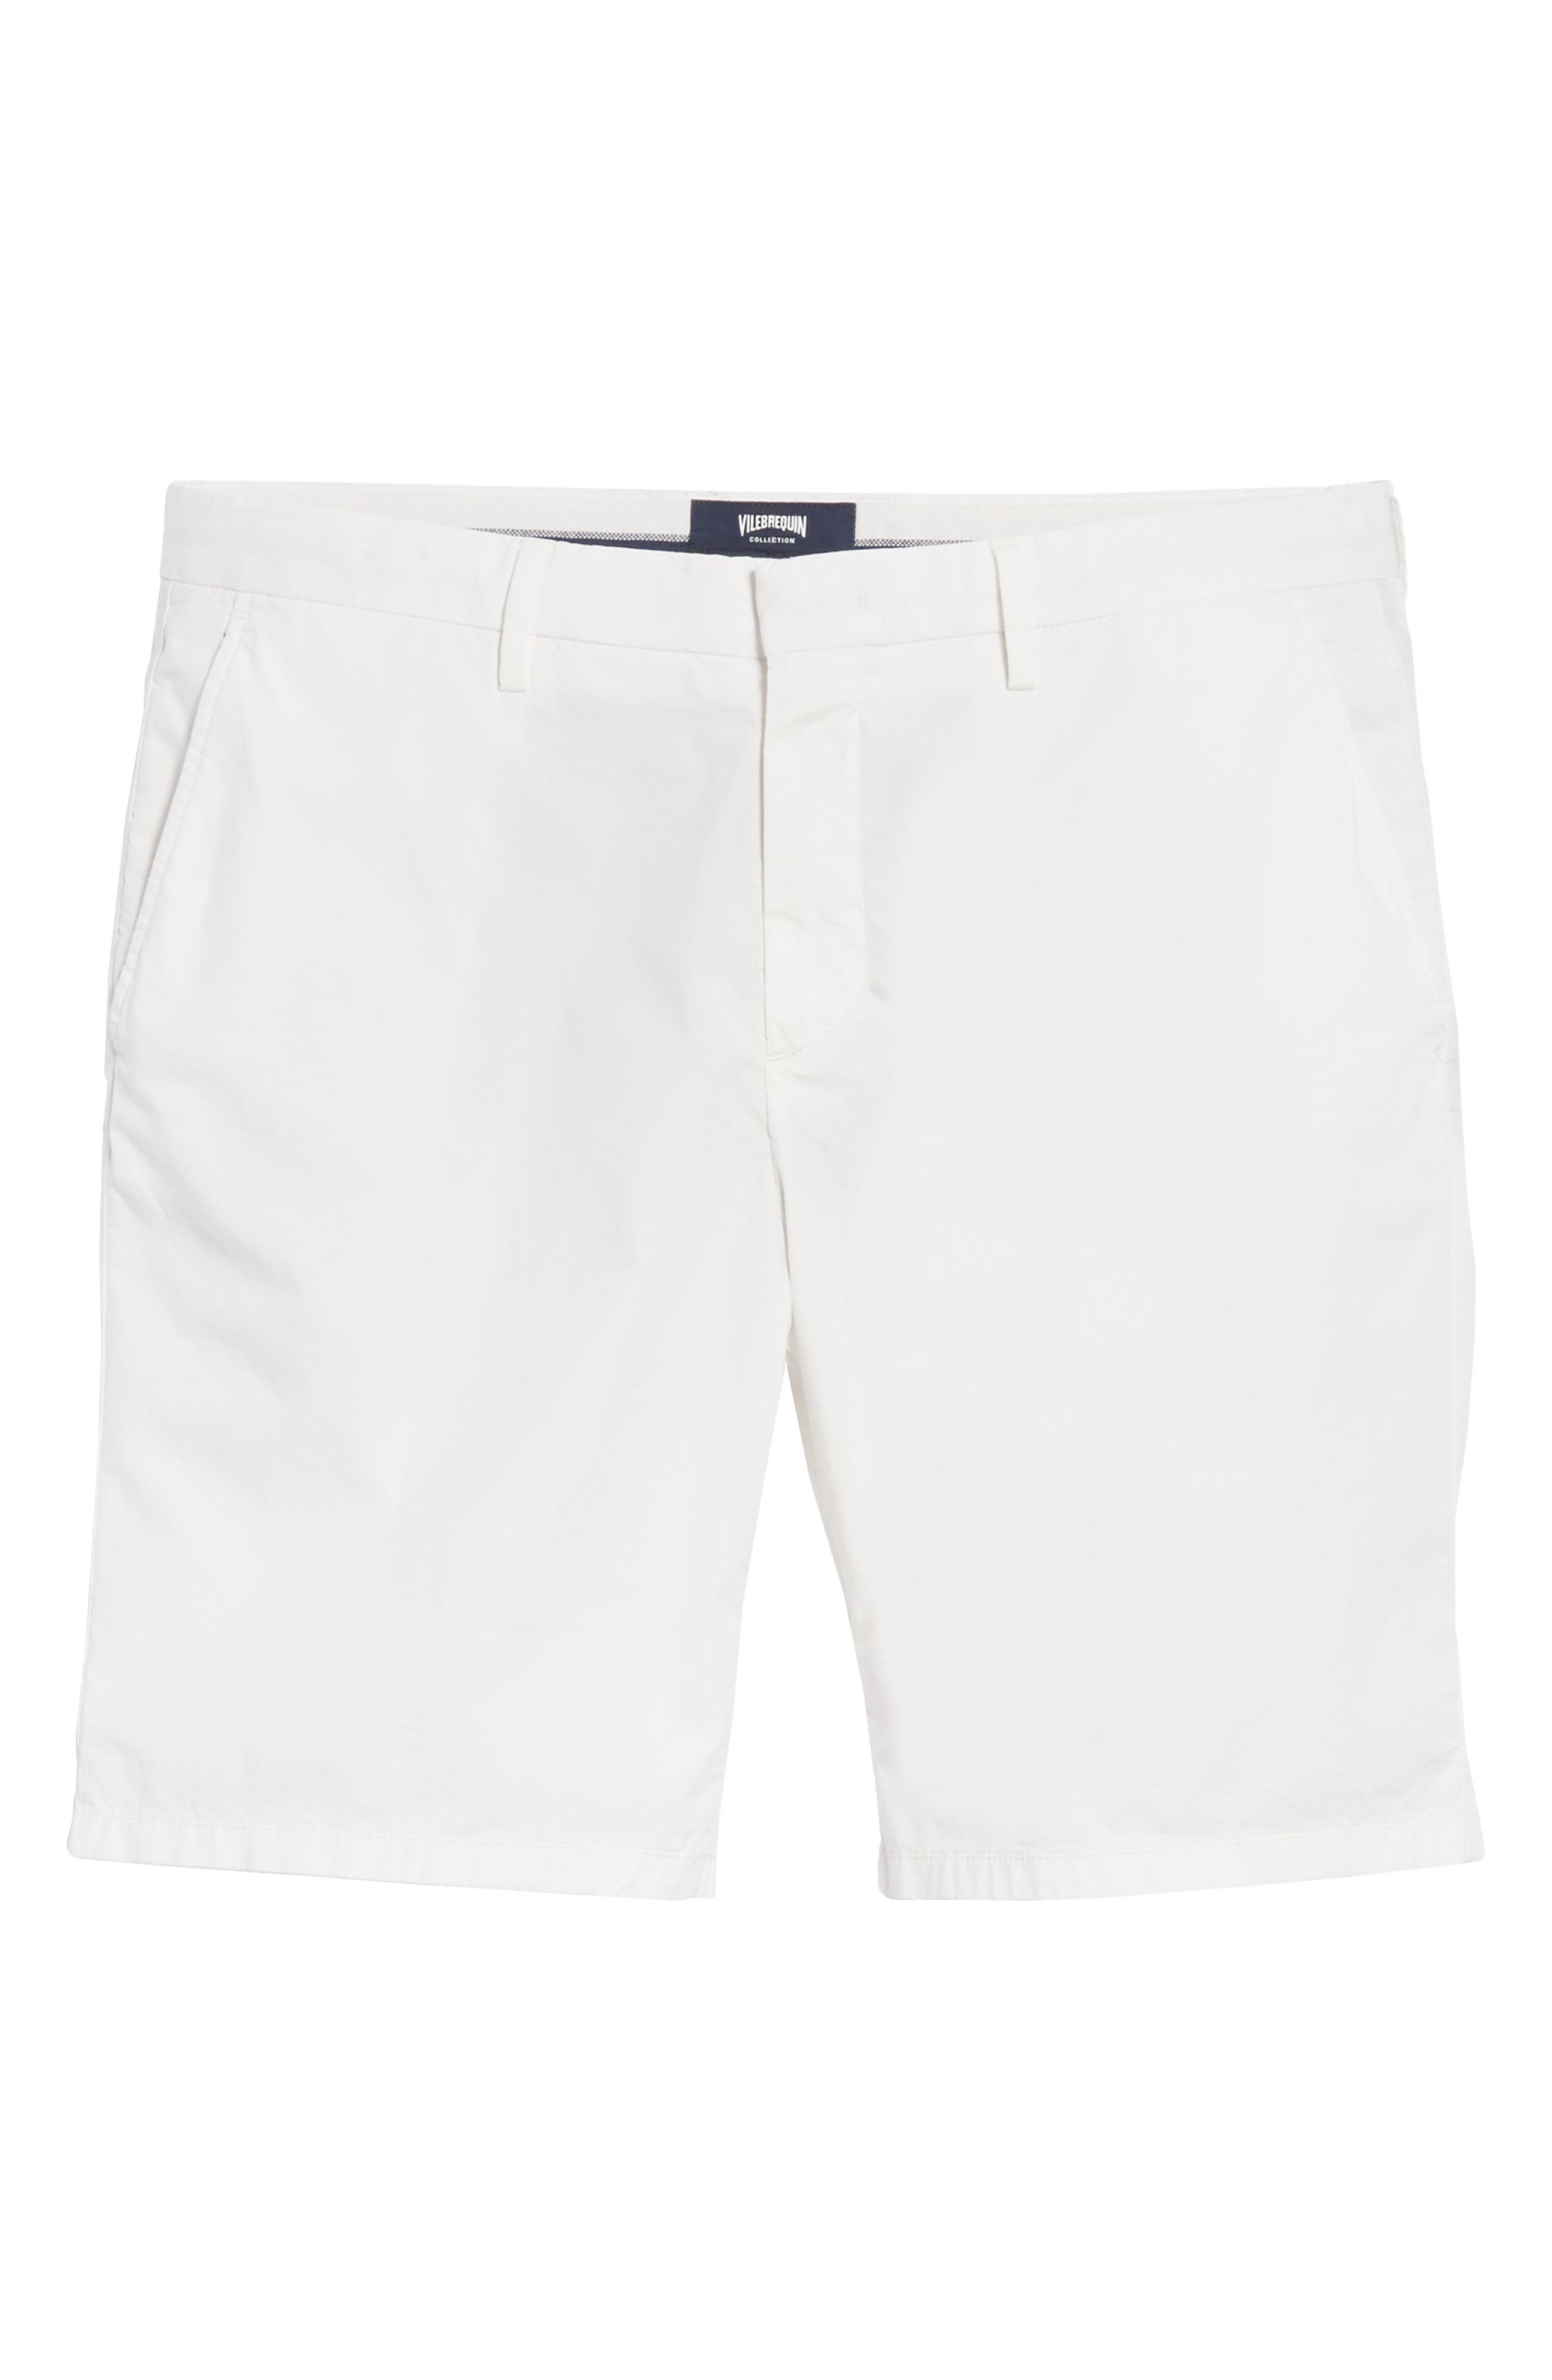 Poplin Chino Shorts,                             Alternate thumbnail 6, color,                             CANVAS